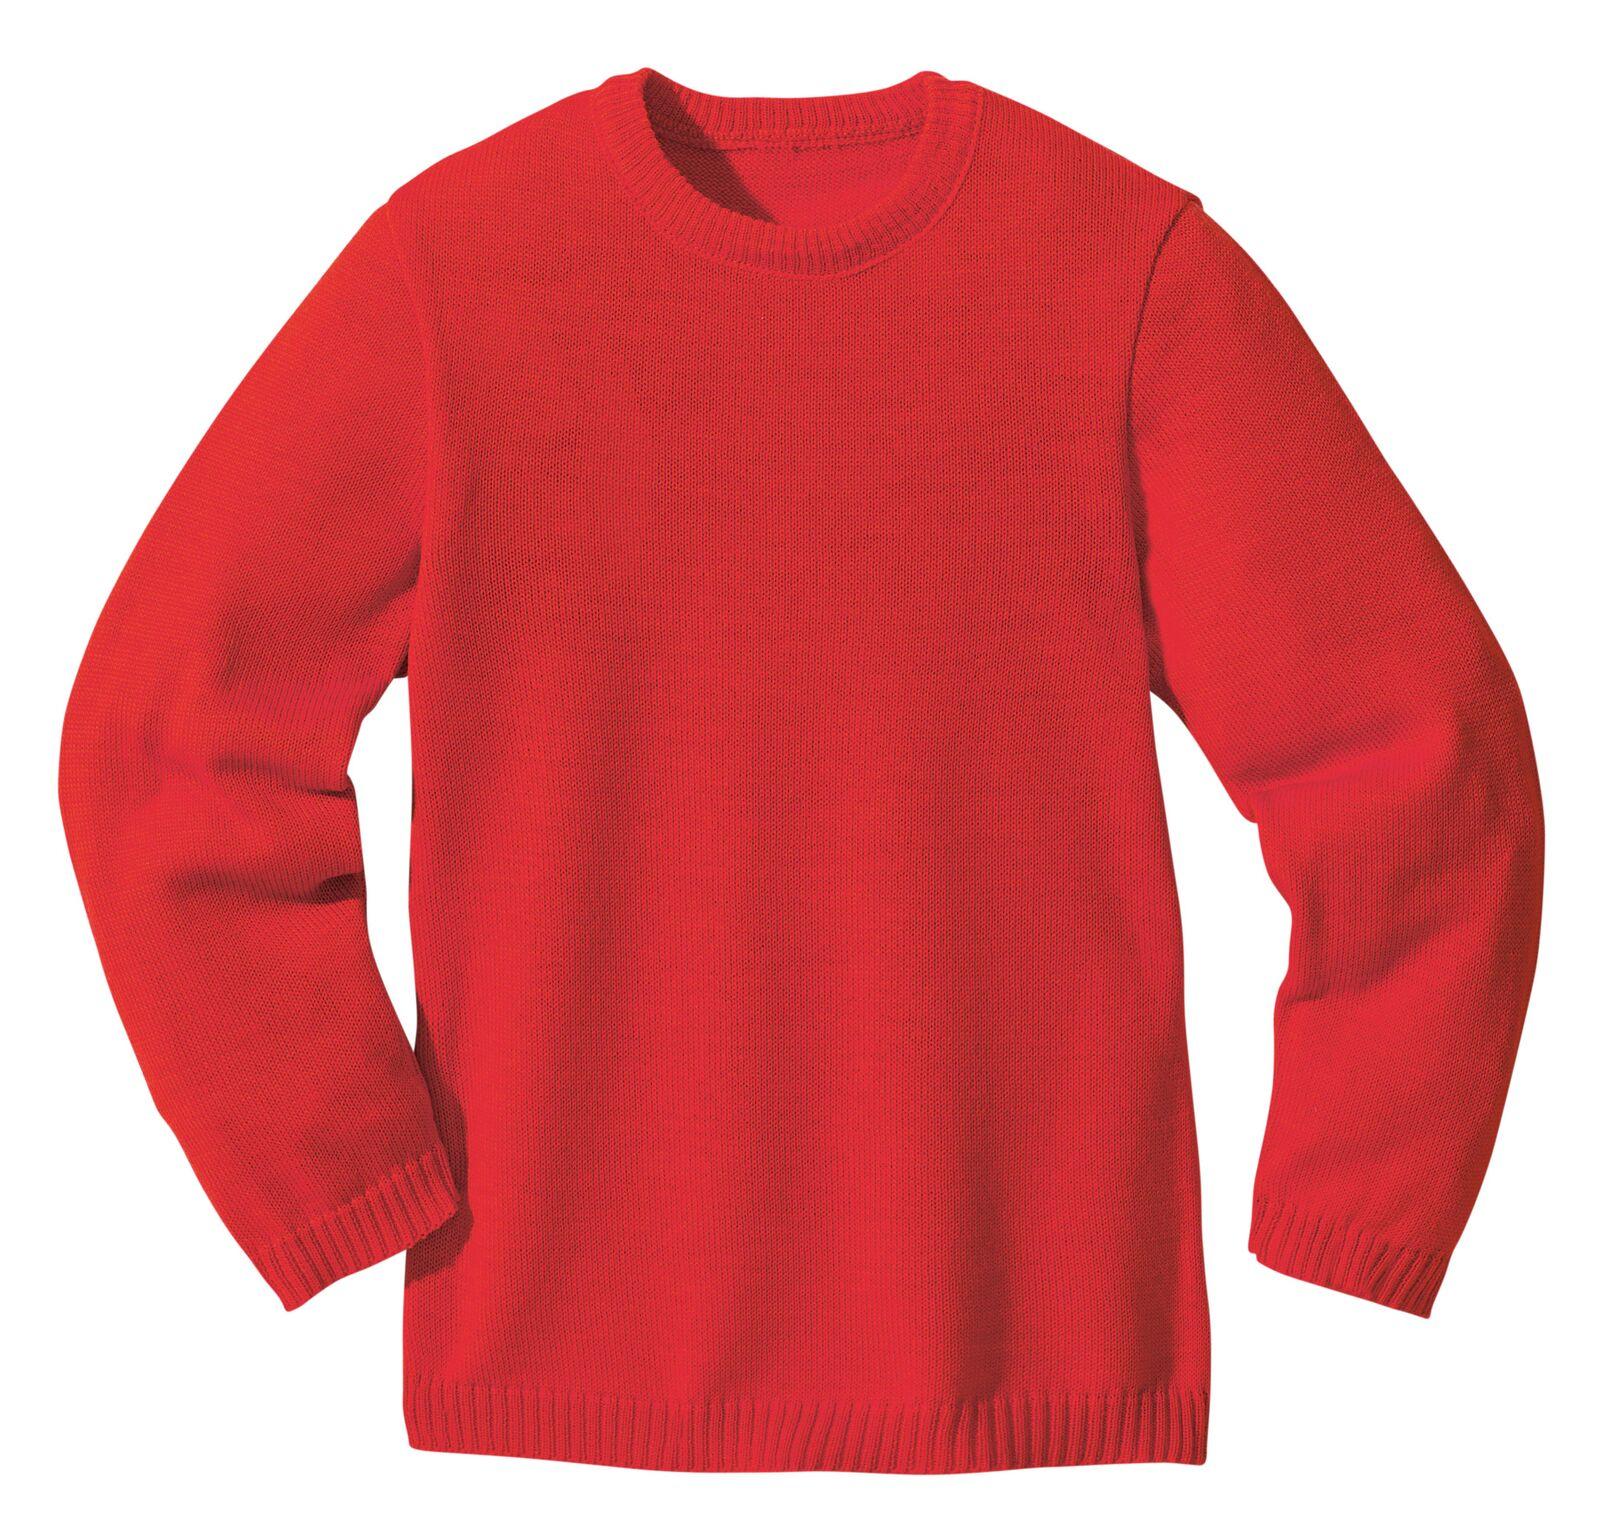 Disana pletený vlněný svetr ze 100% merino vlny  9e8e9b3626